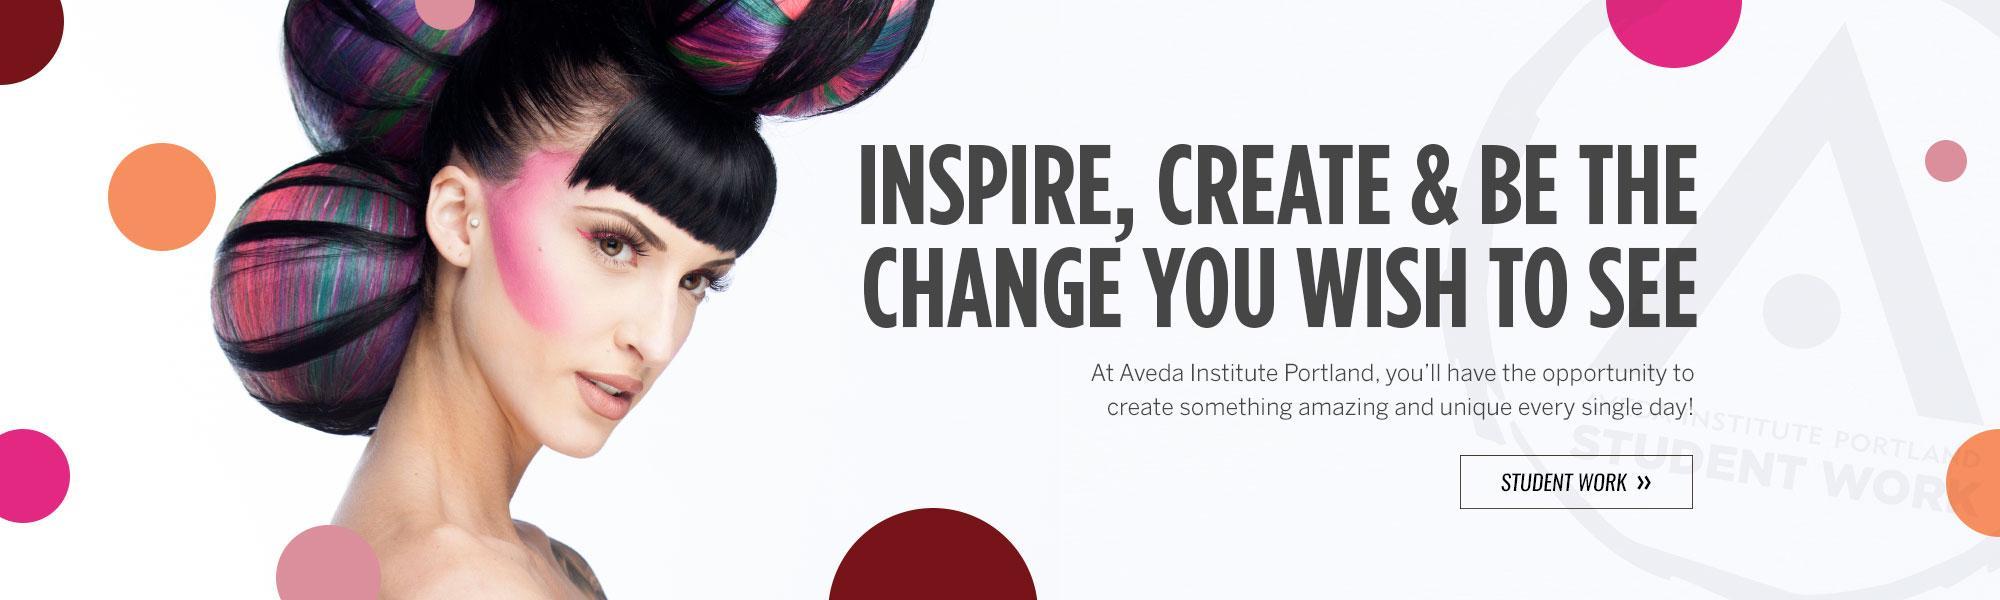 Aveda Institute Portland Student Work